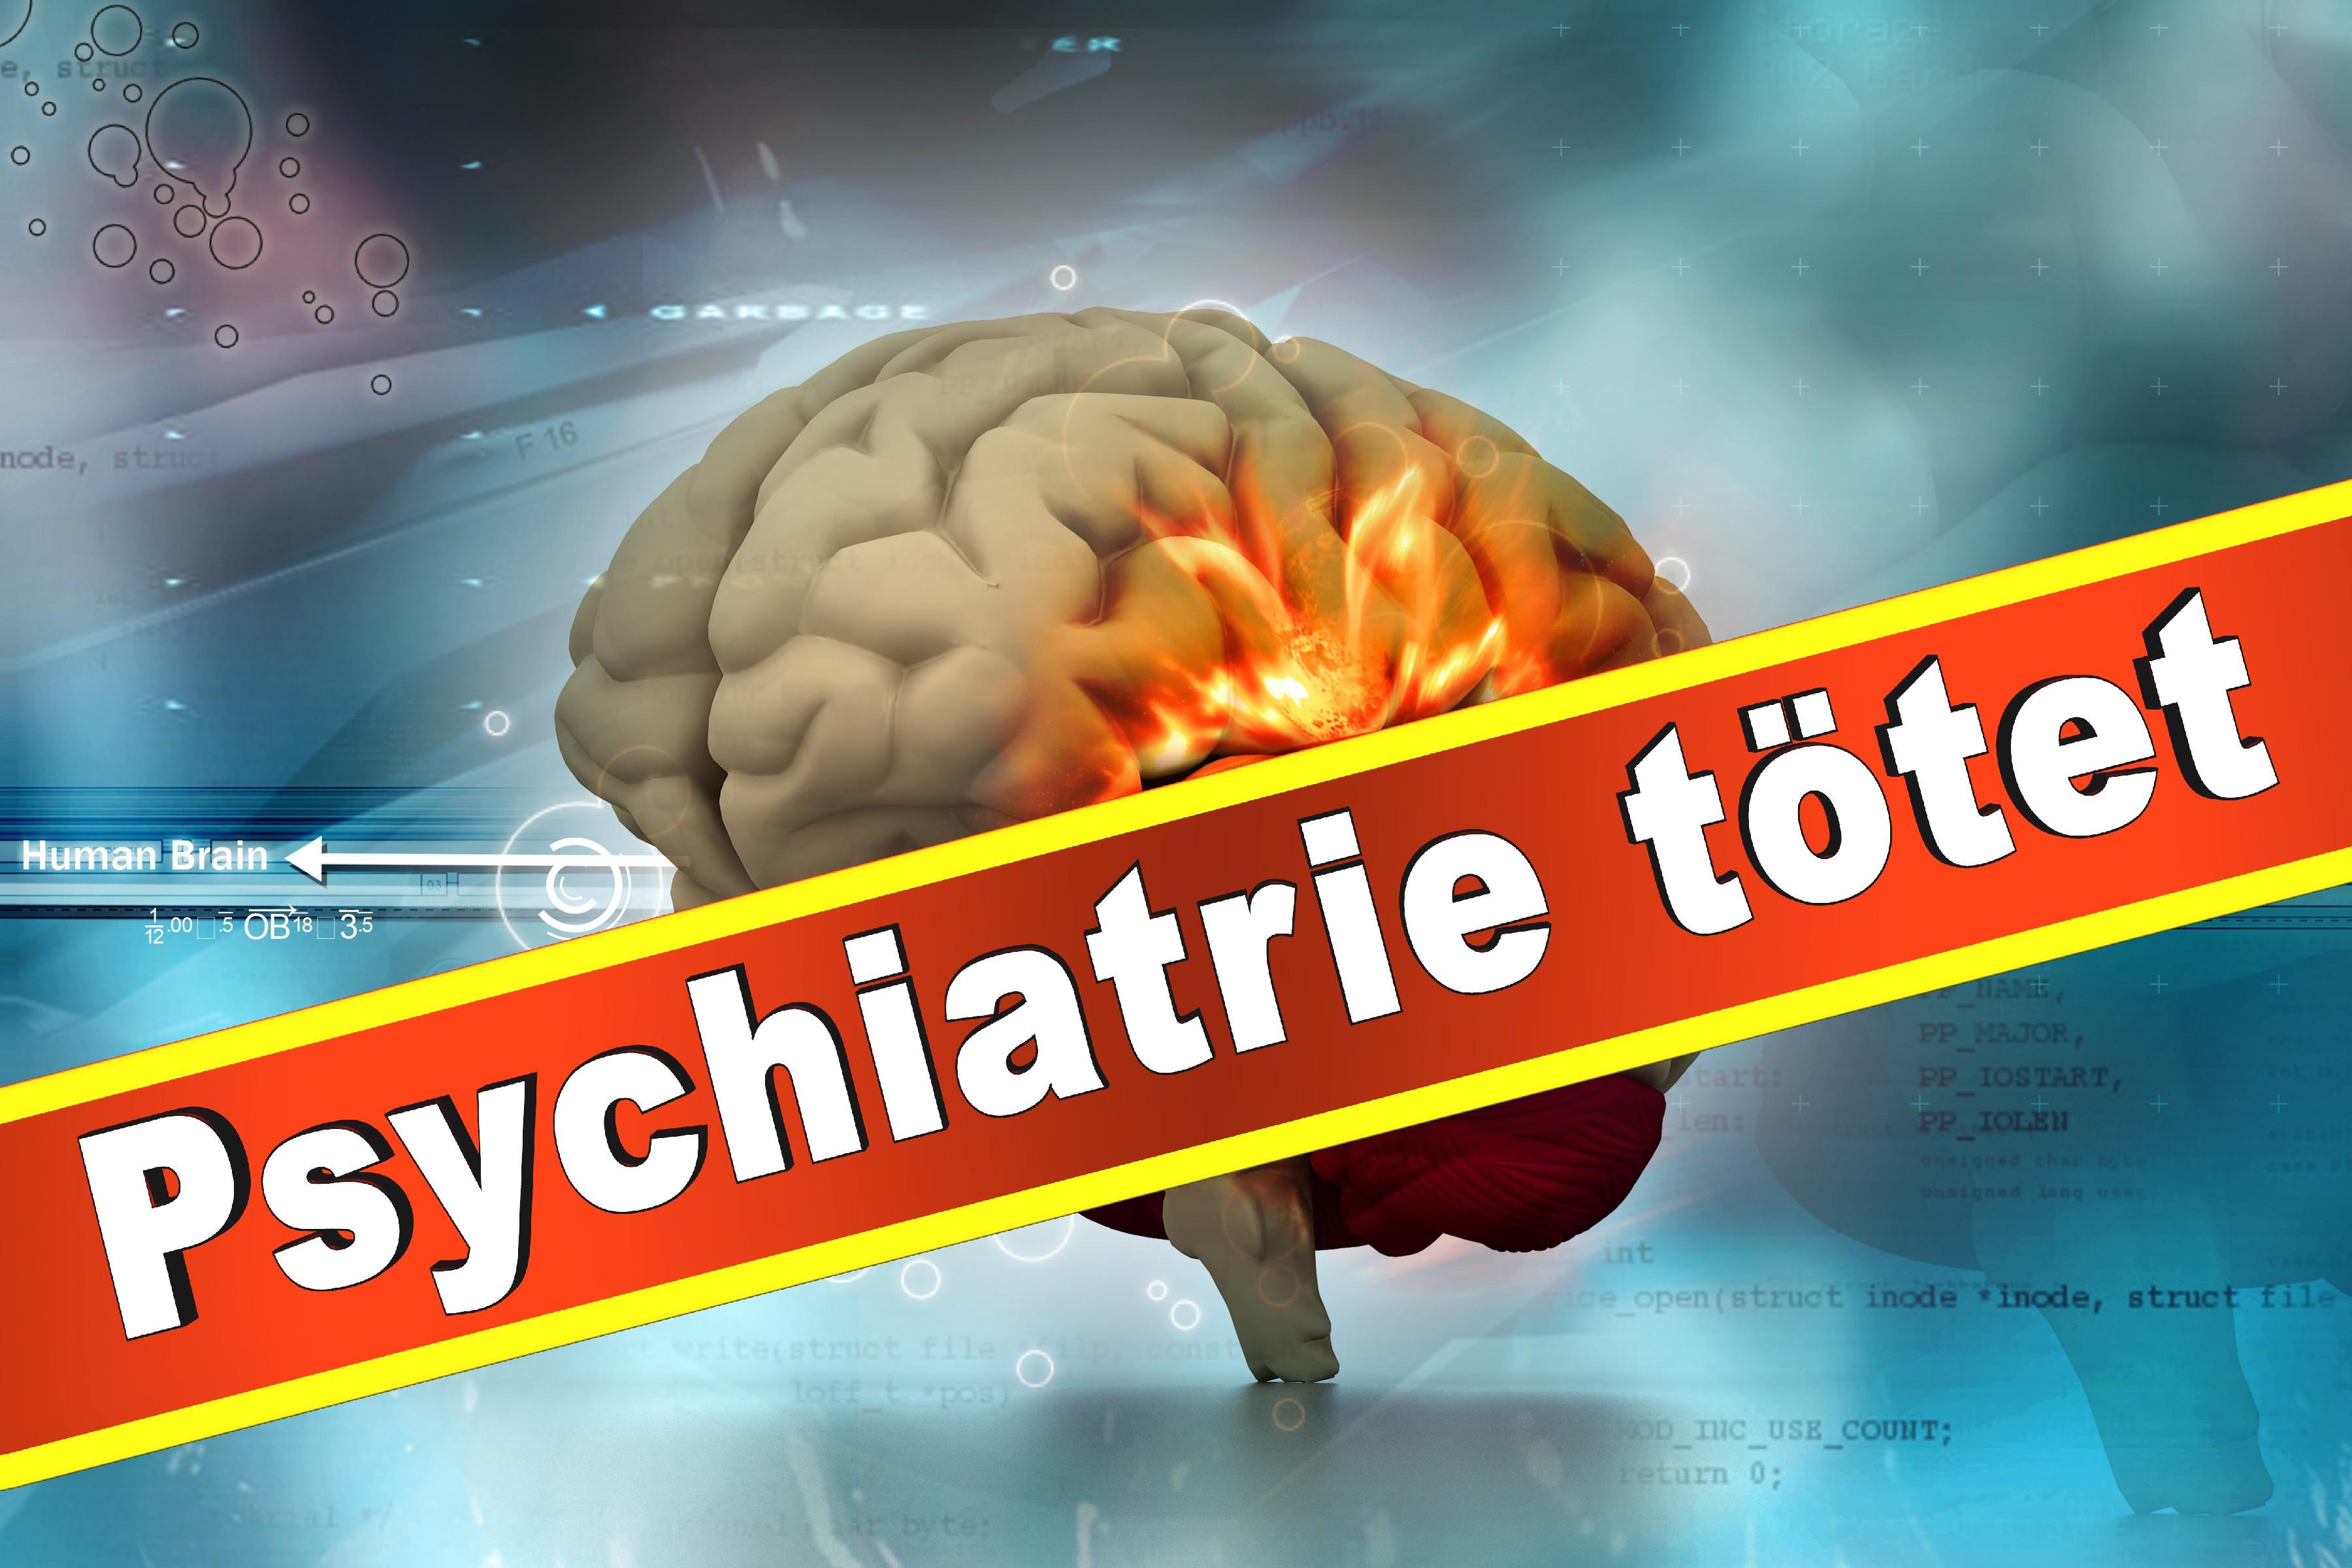 Herr Christian Kukuczka Arzt Hannover Gutachten Psychiater Facharzt Psychiatrie Psychotherapie